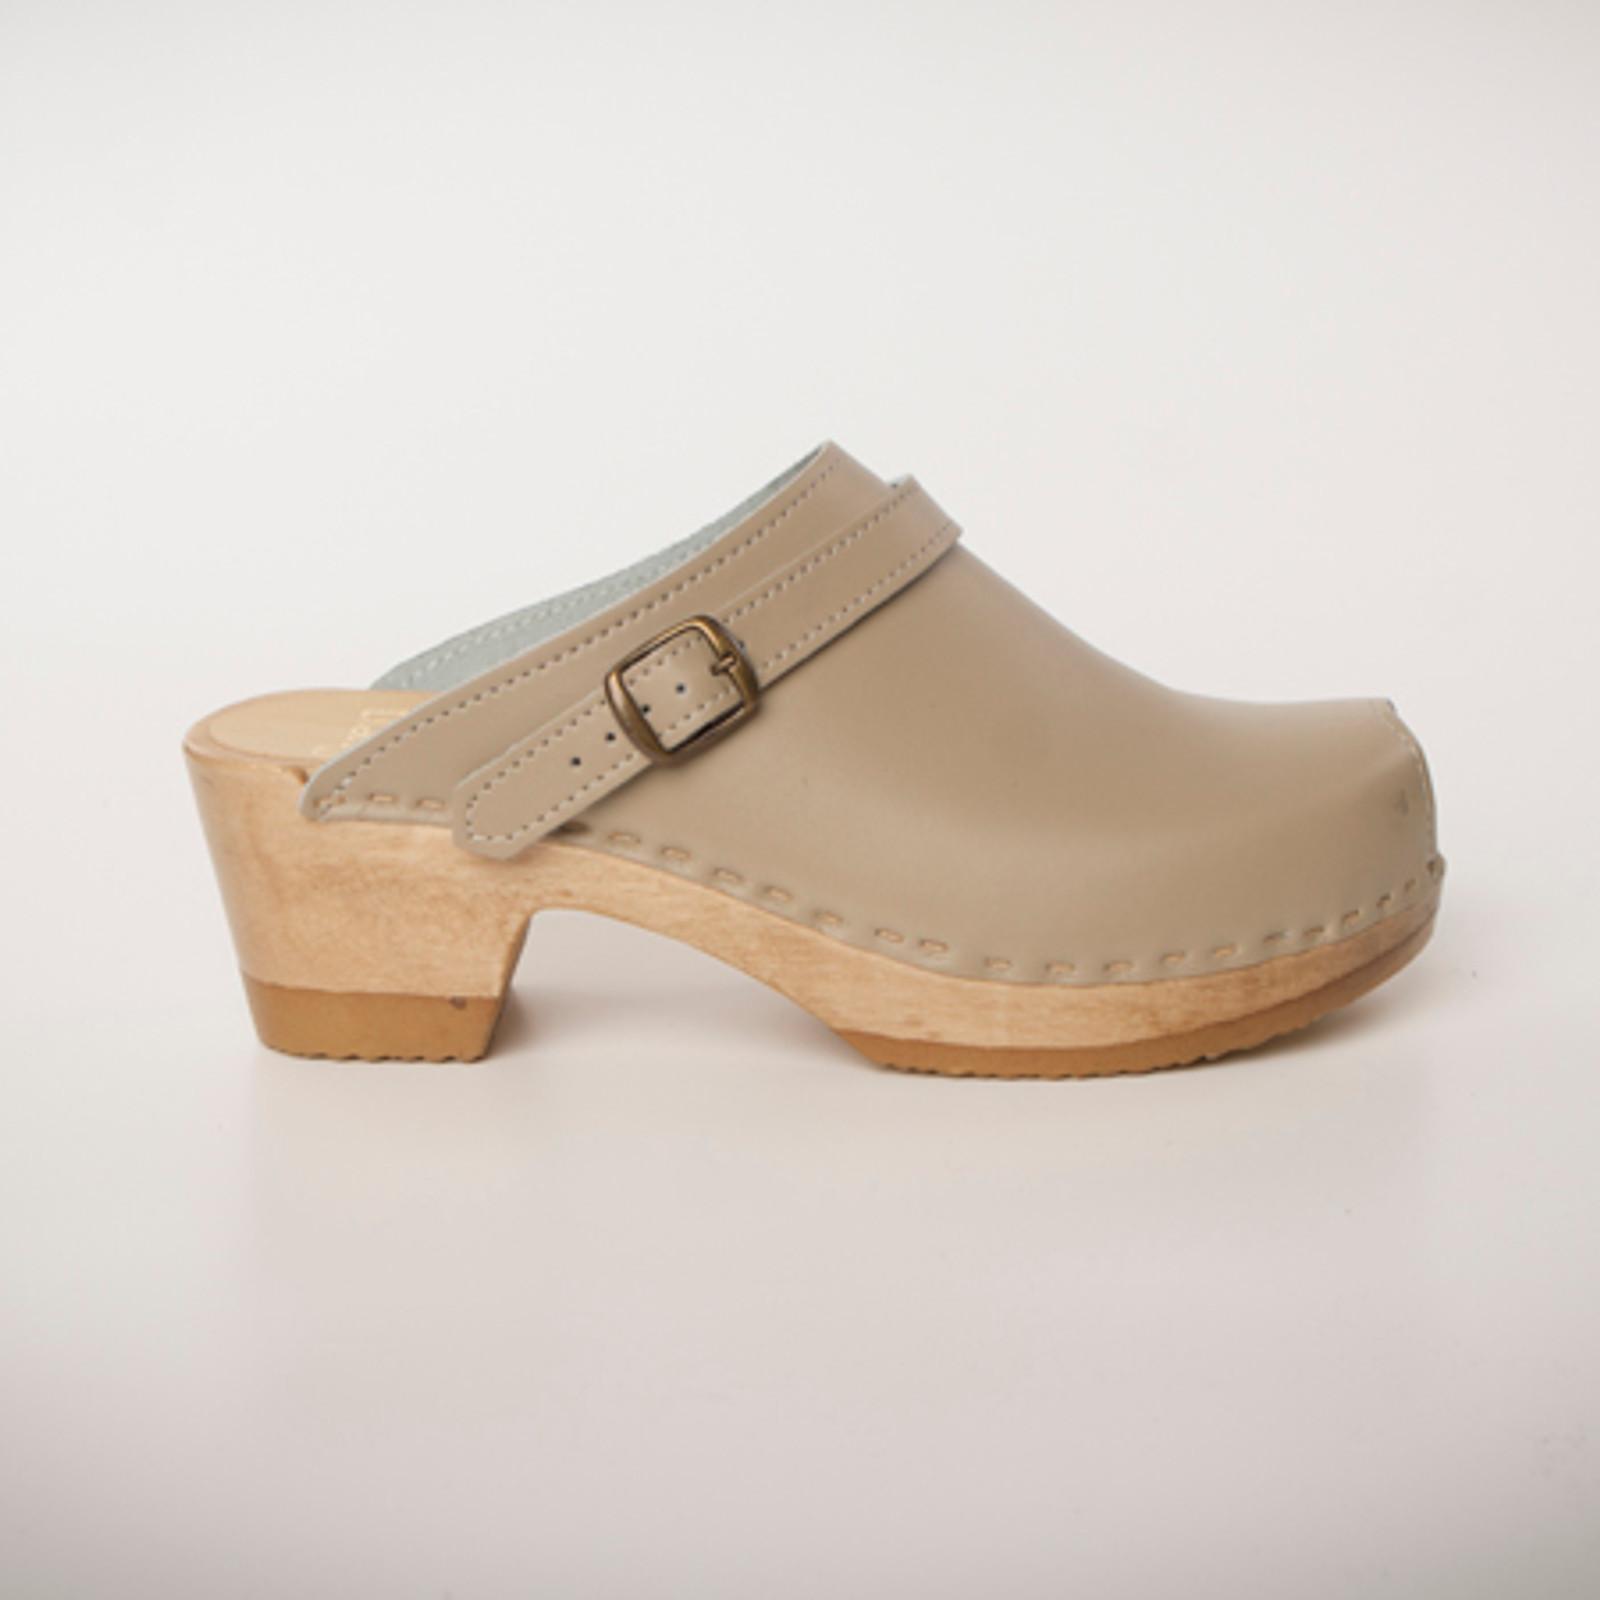 Peep Toe Clogs with Sling - Mid Heels